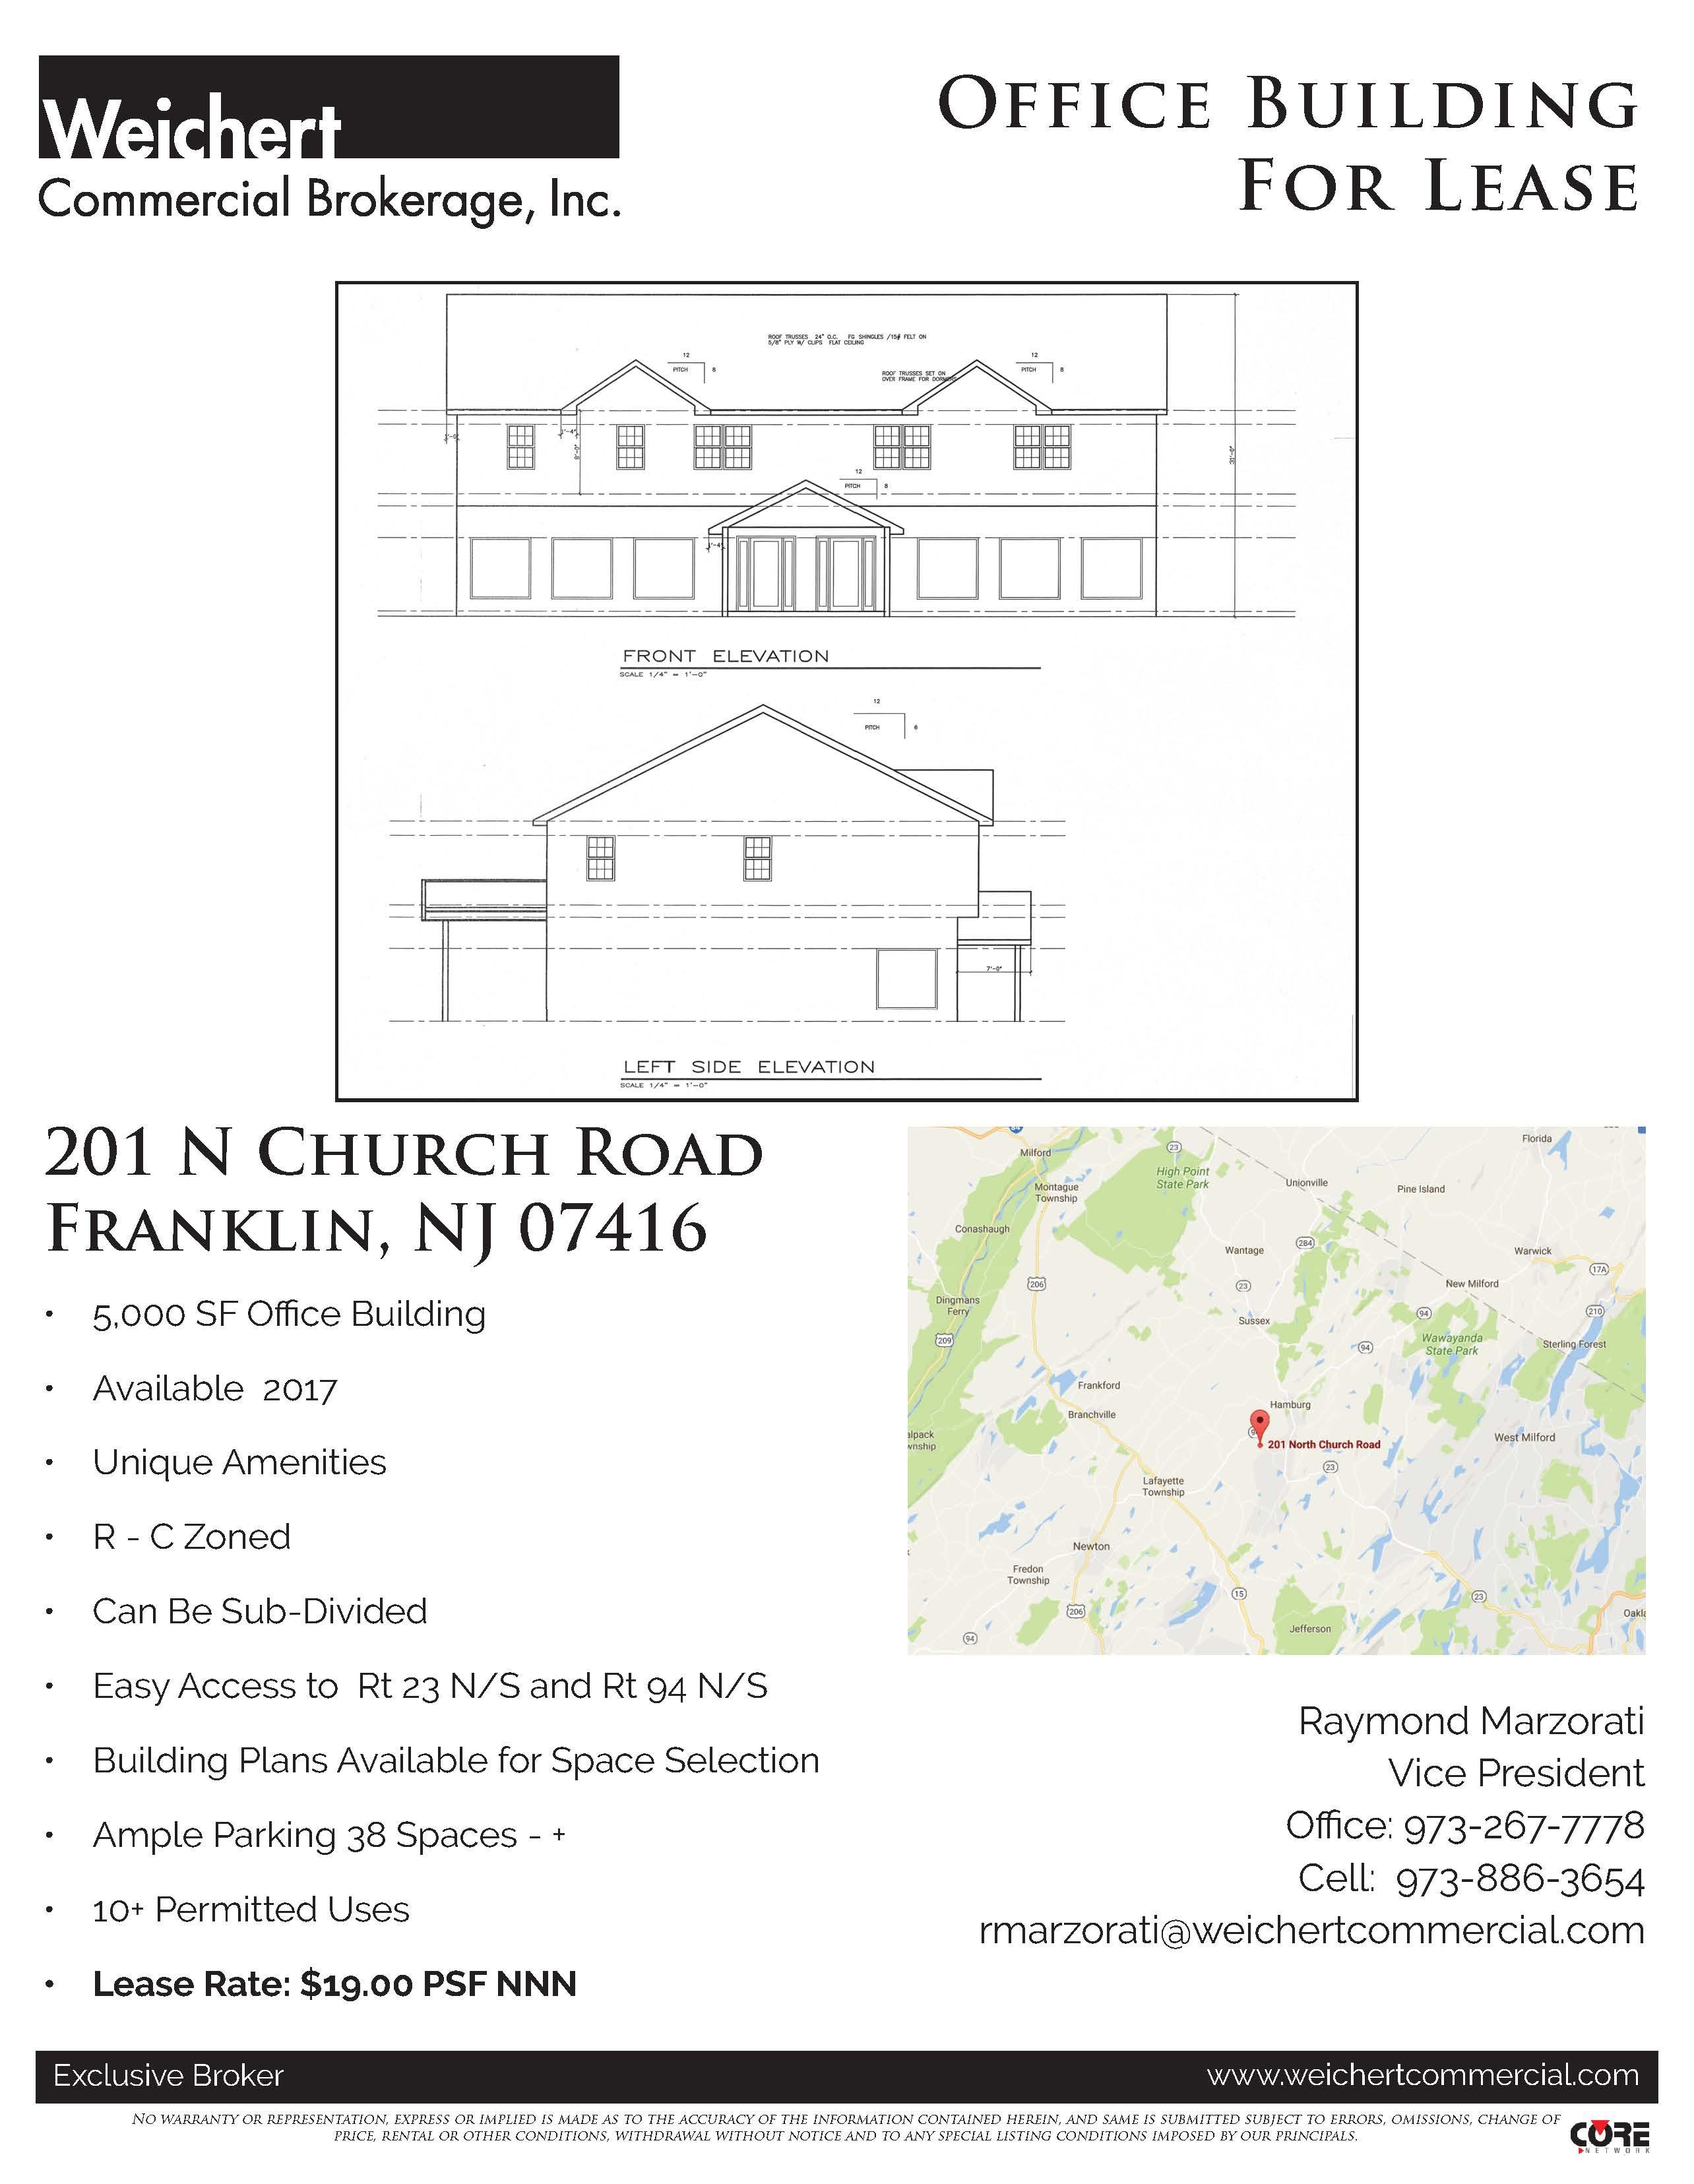 Marzorati- 201 N Church Rd, Franklin